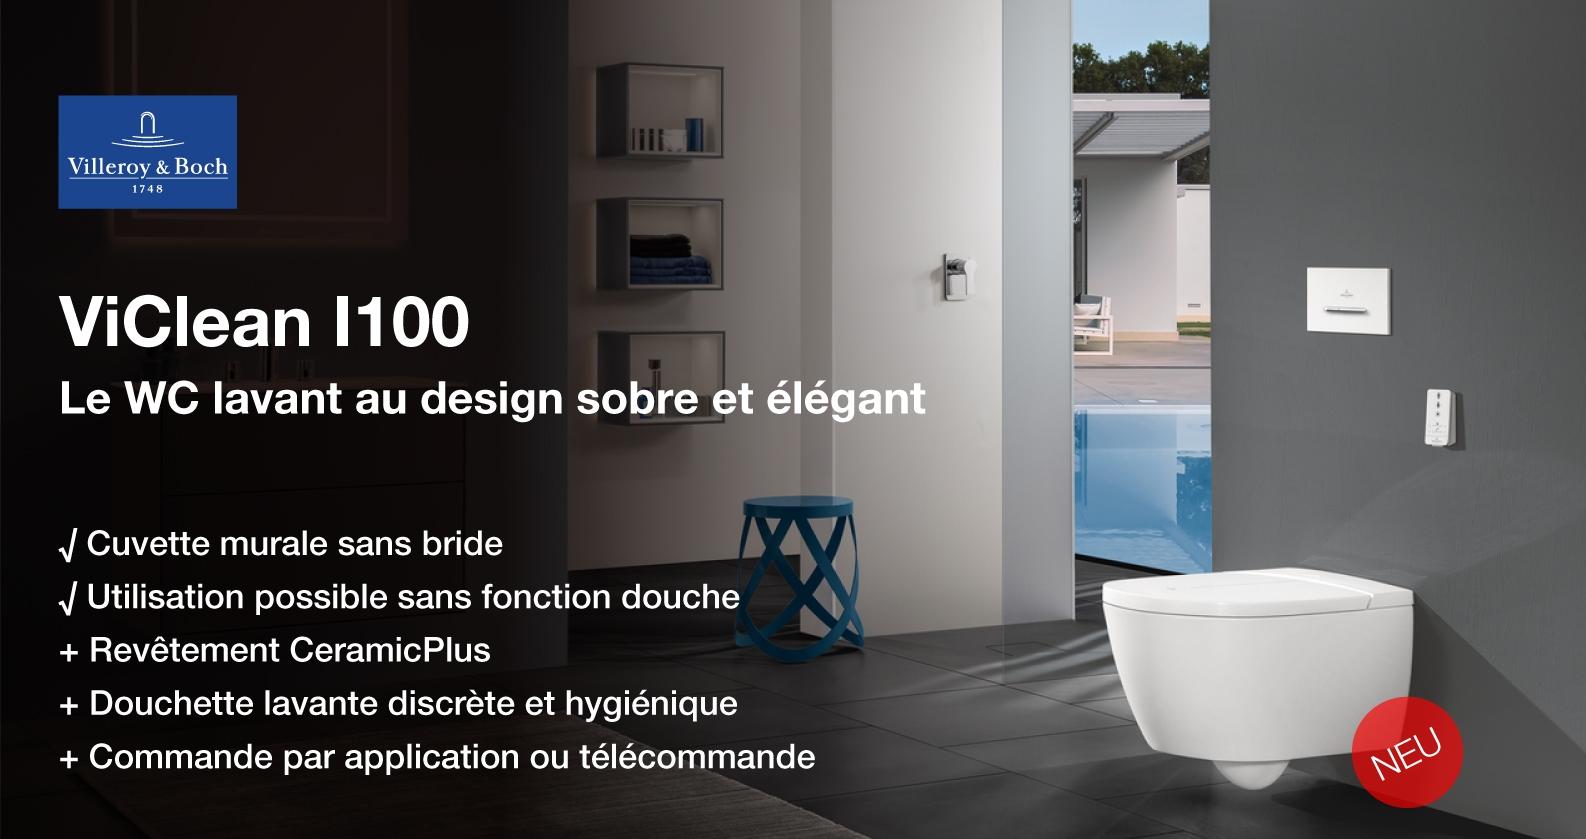 Villeroy & Boch ViClean wc lavant